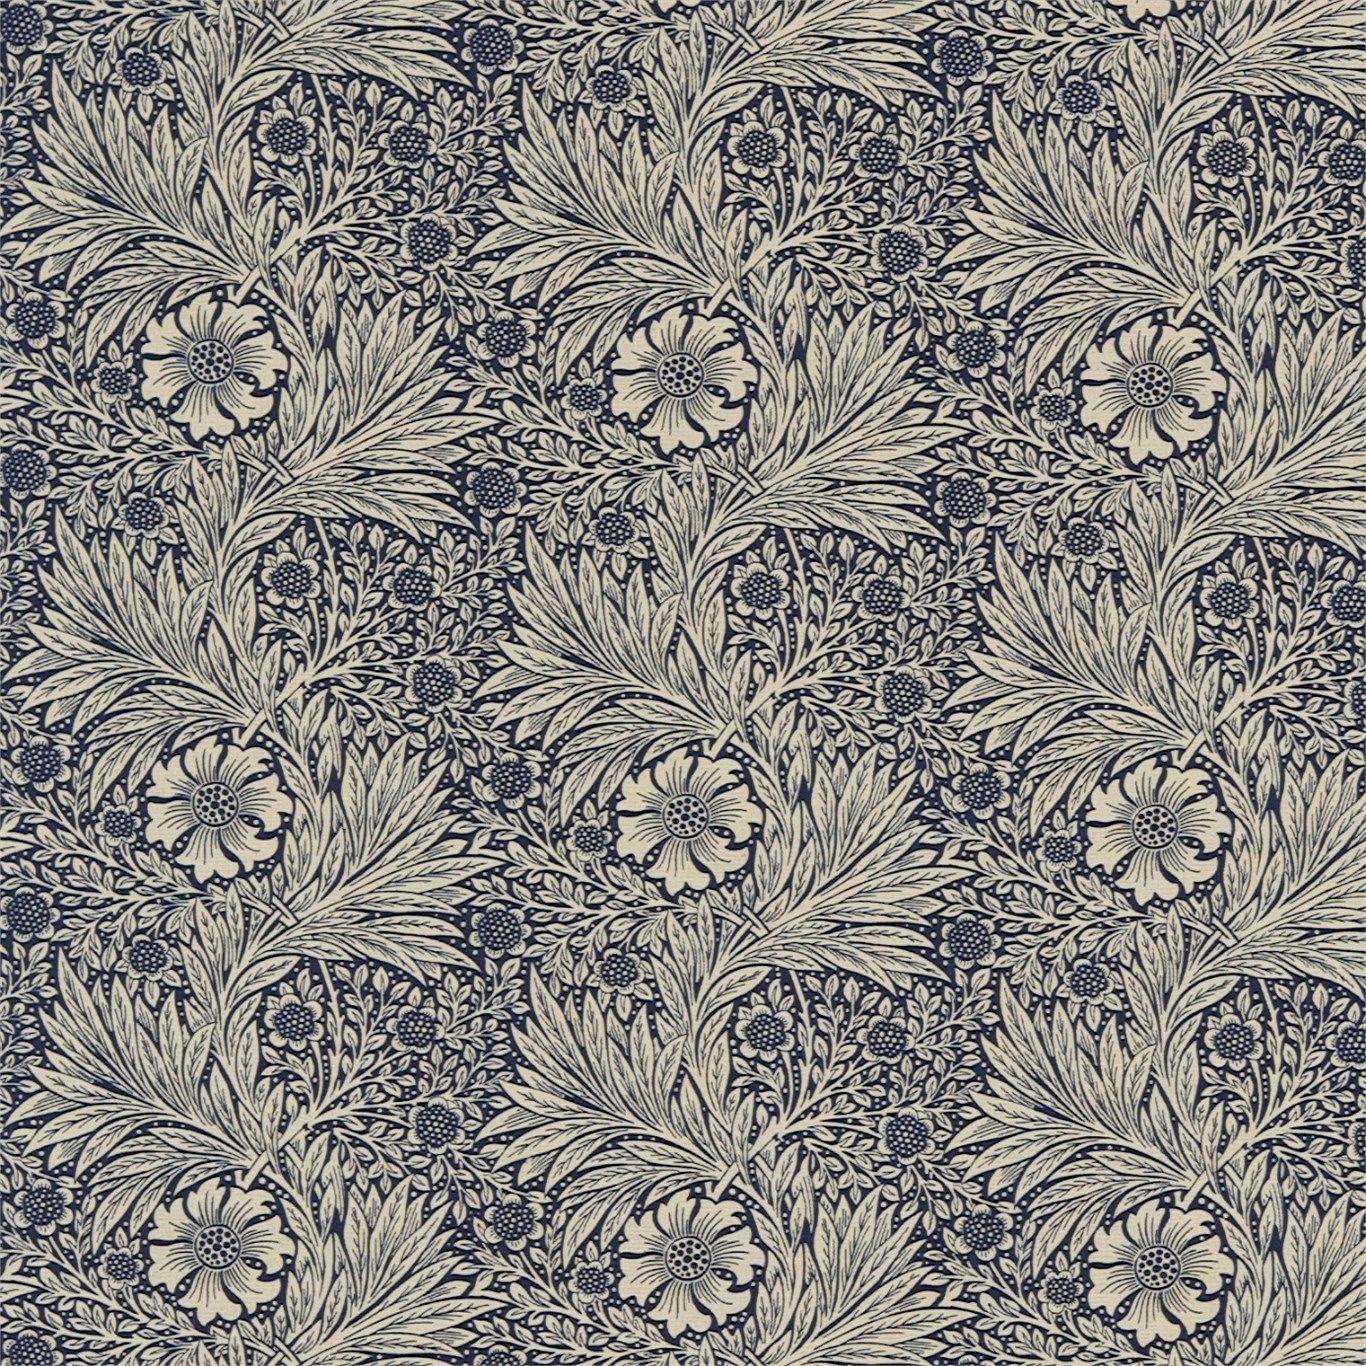 William Morris Wallpaper: Arts And Crafts, Fabrics And